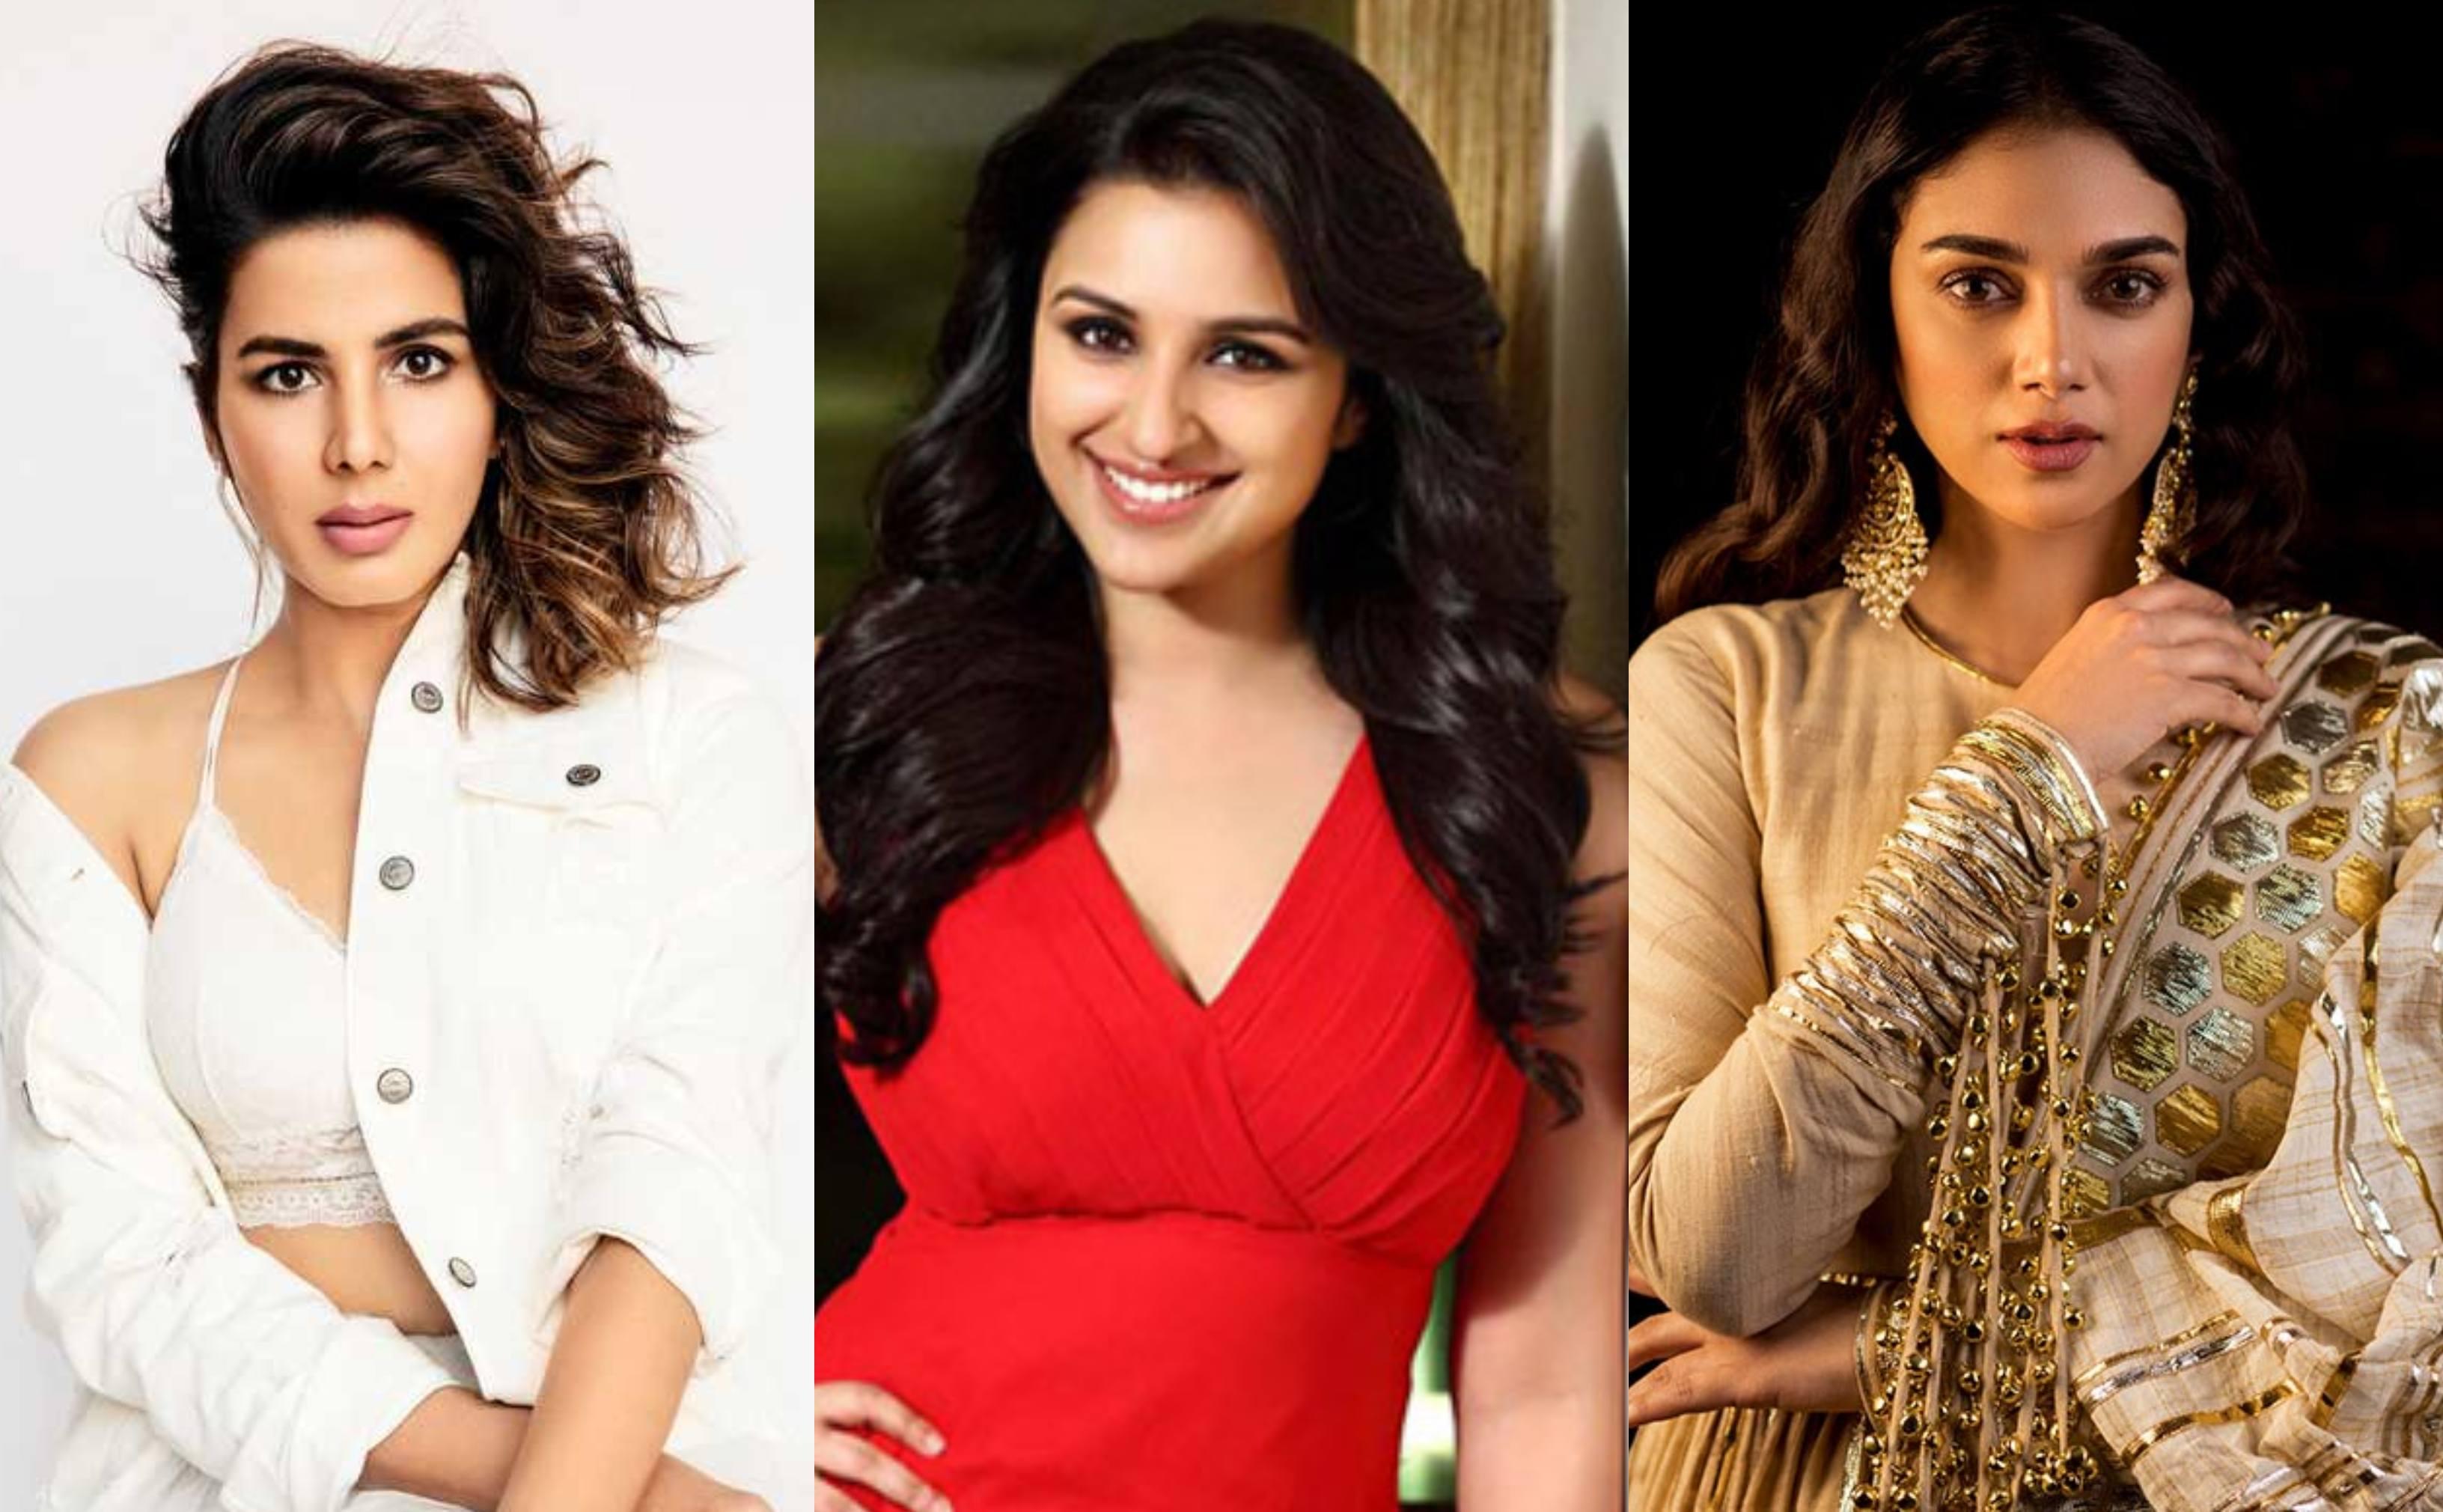 Kirti Kulhari And Aditi Rao Hydari Join The Cast Of The Girl On The Train